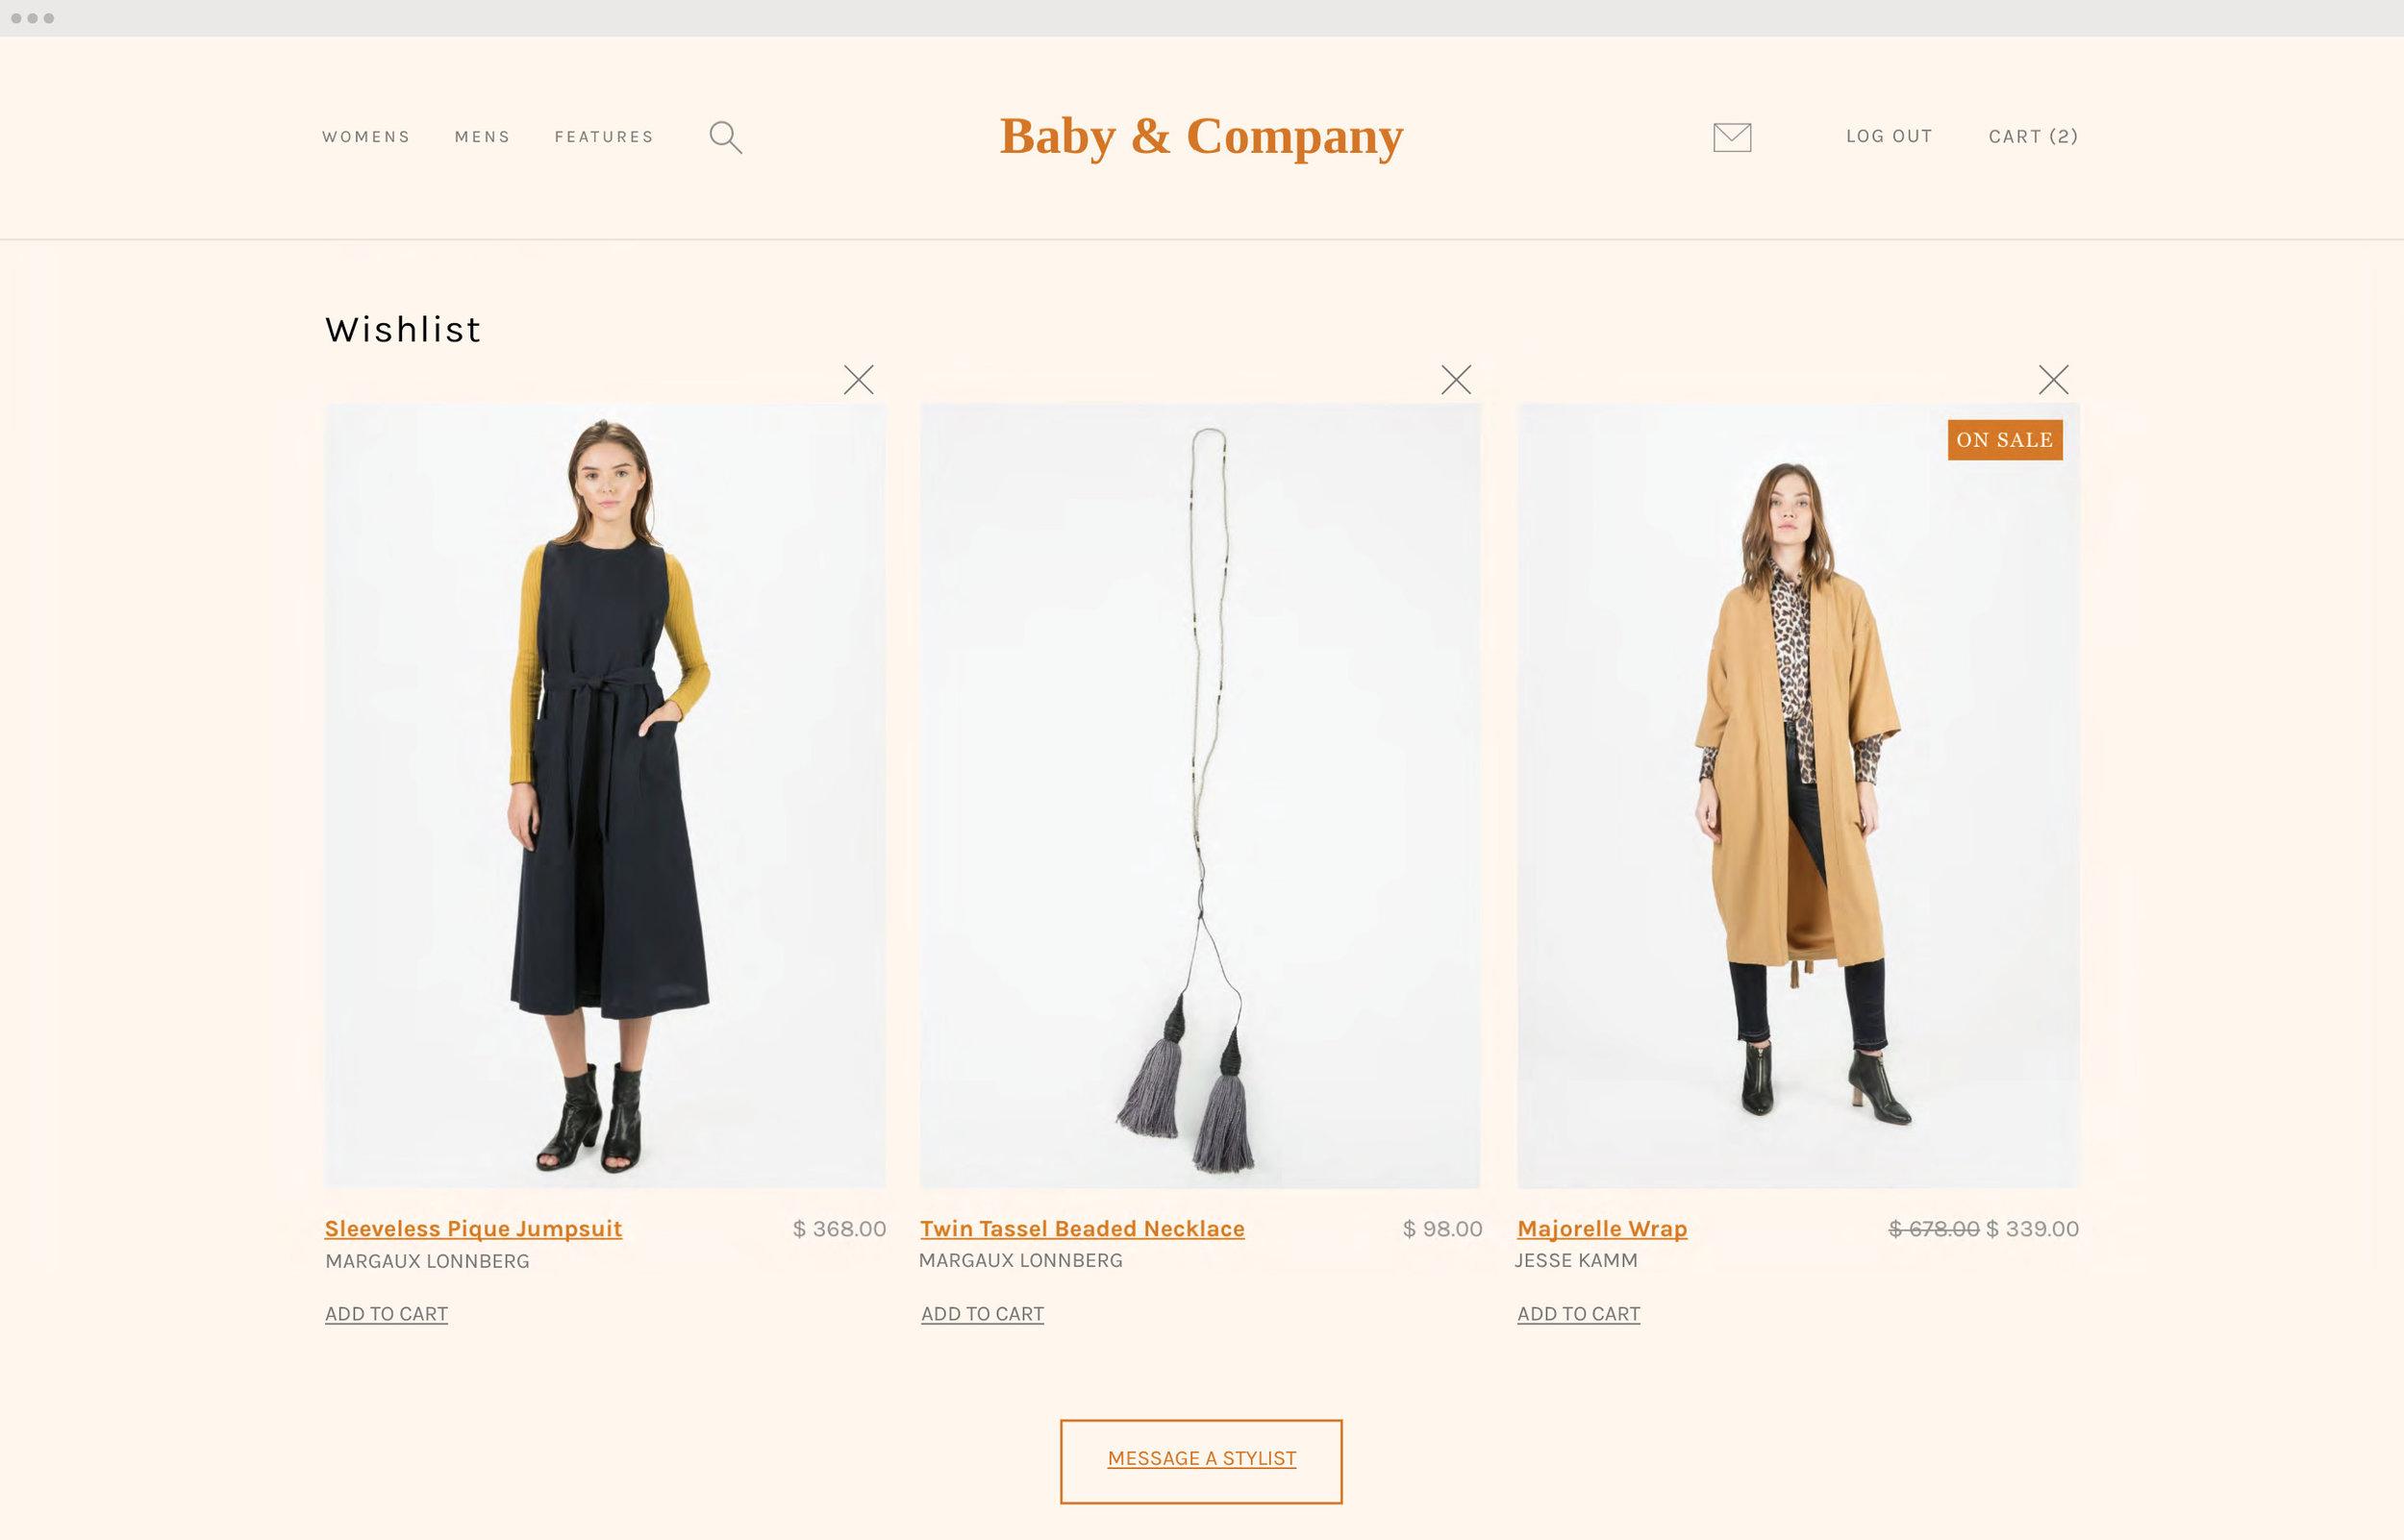 Web Tiles_2019_Web Design - B&C site customization15.jpg